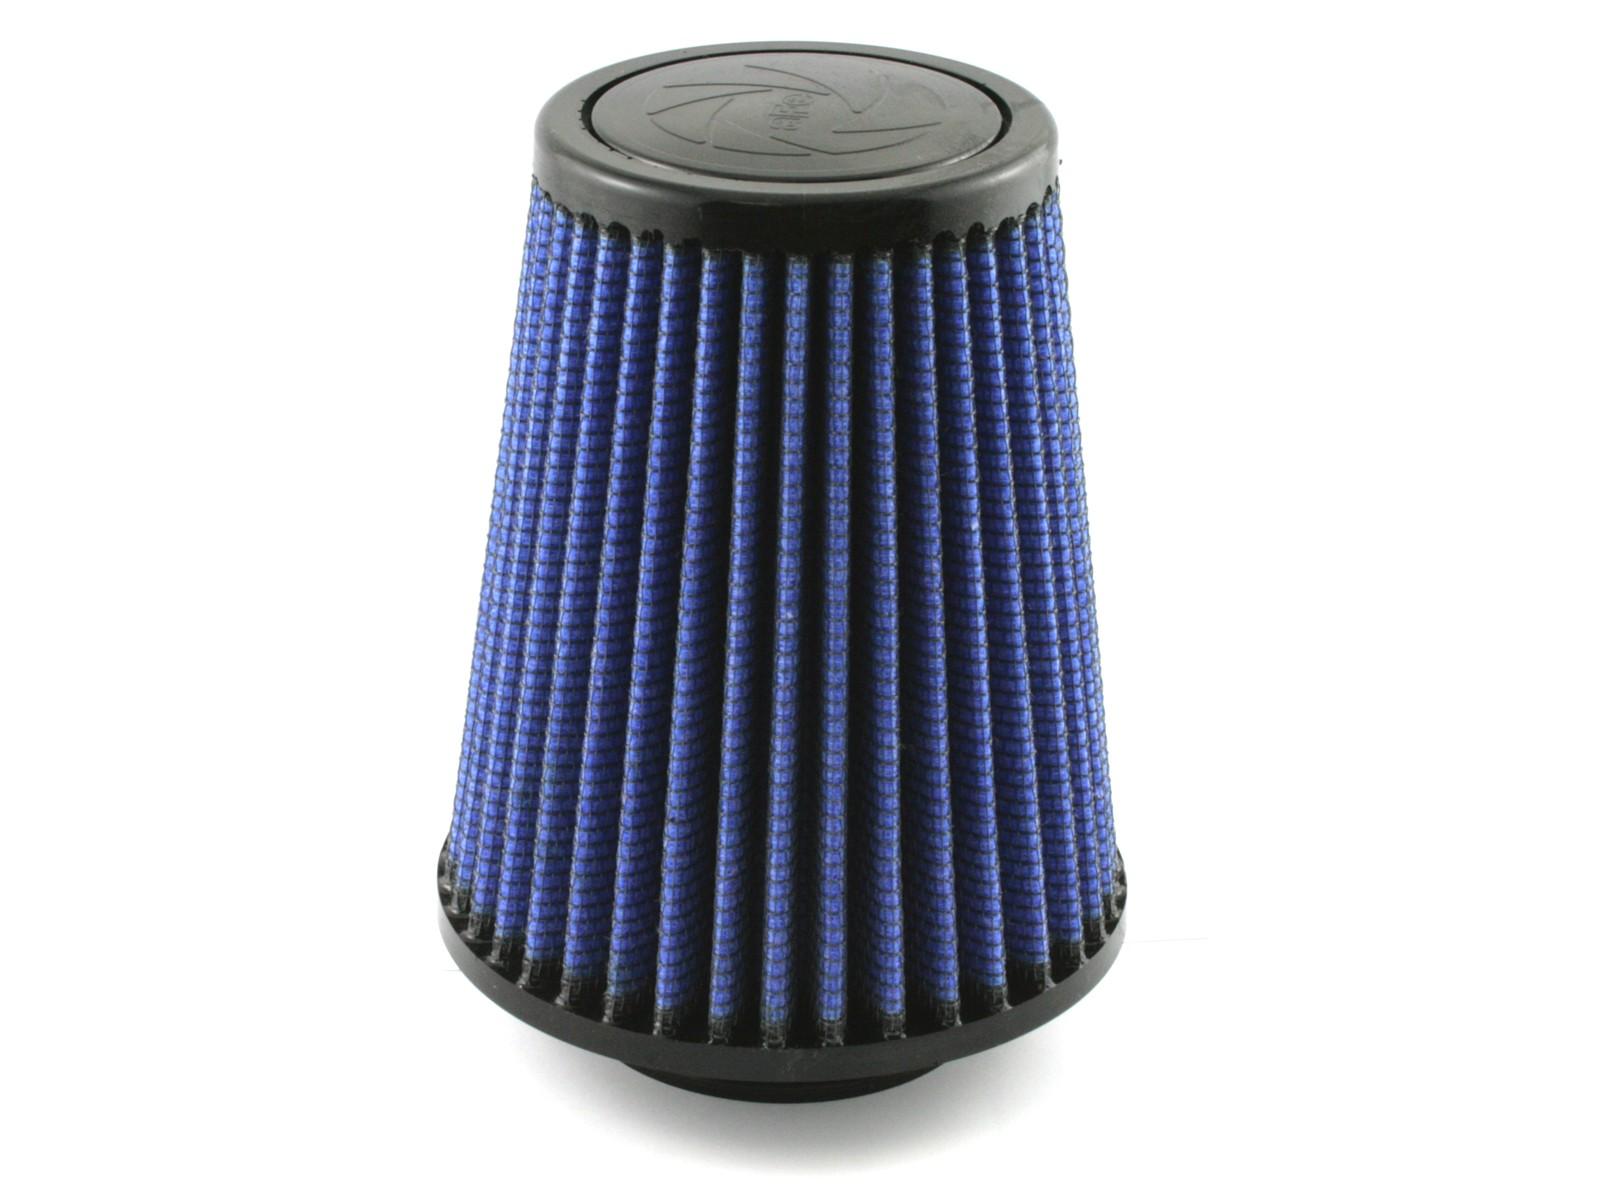 aFe POWER 24-25506 Magnum FLOW Pro 5R Air Filter